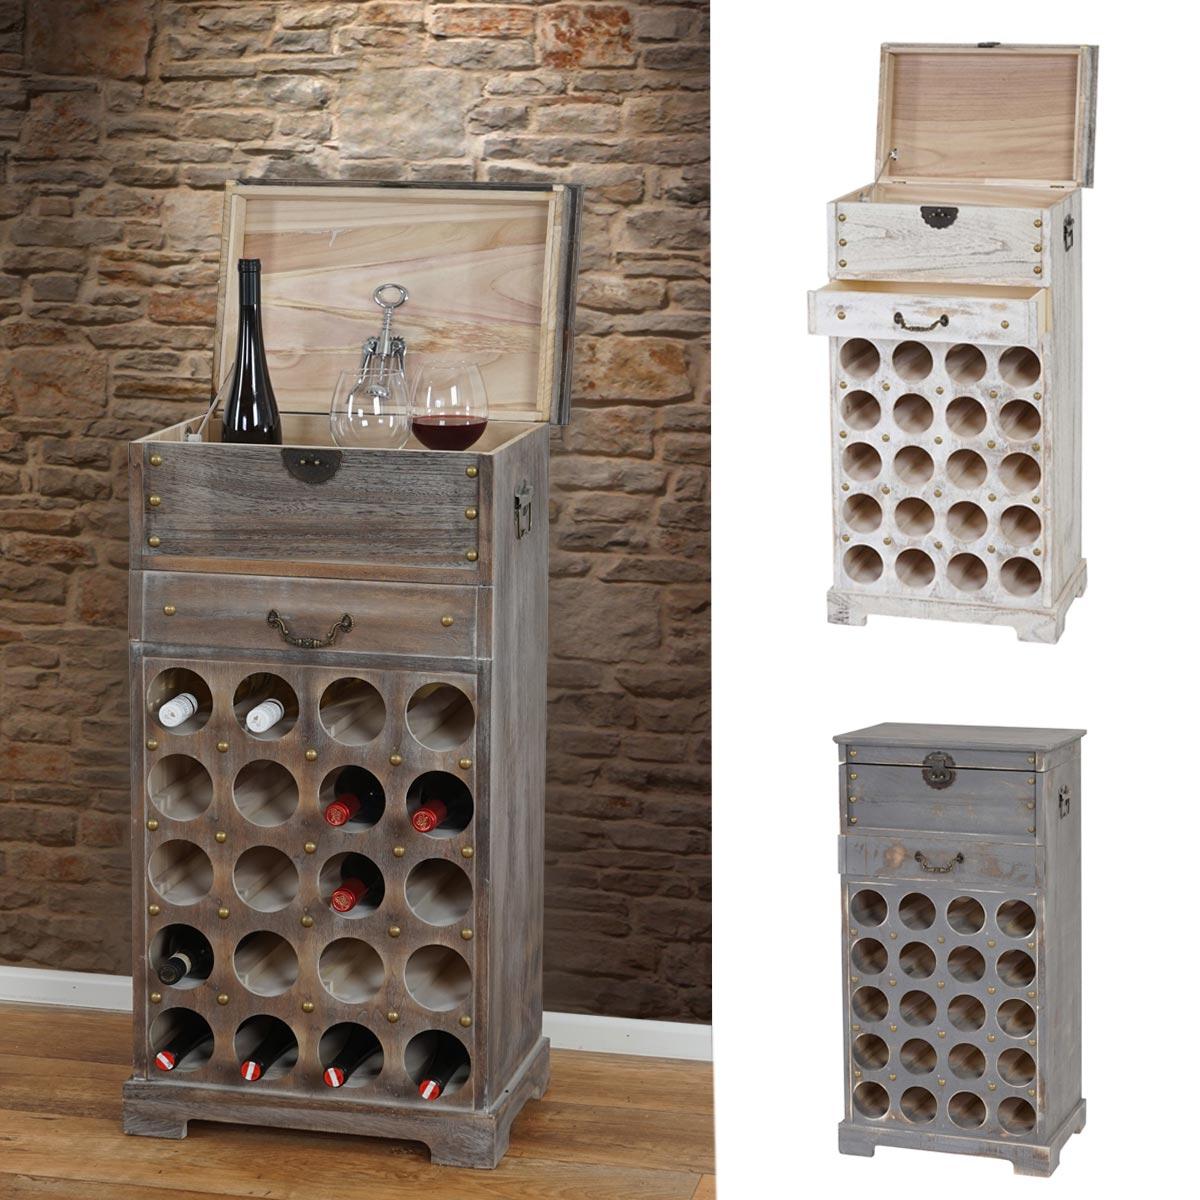 Serie vintage portabottiglie per vini lucan legno paulonia 31x48x94cm ebay - Porta bottiglie ...